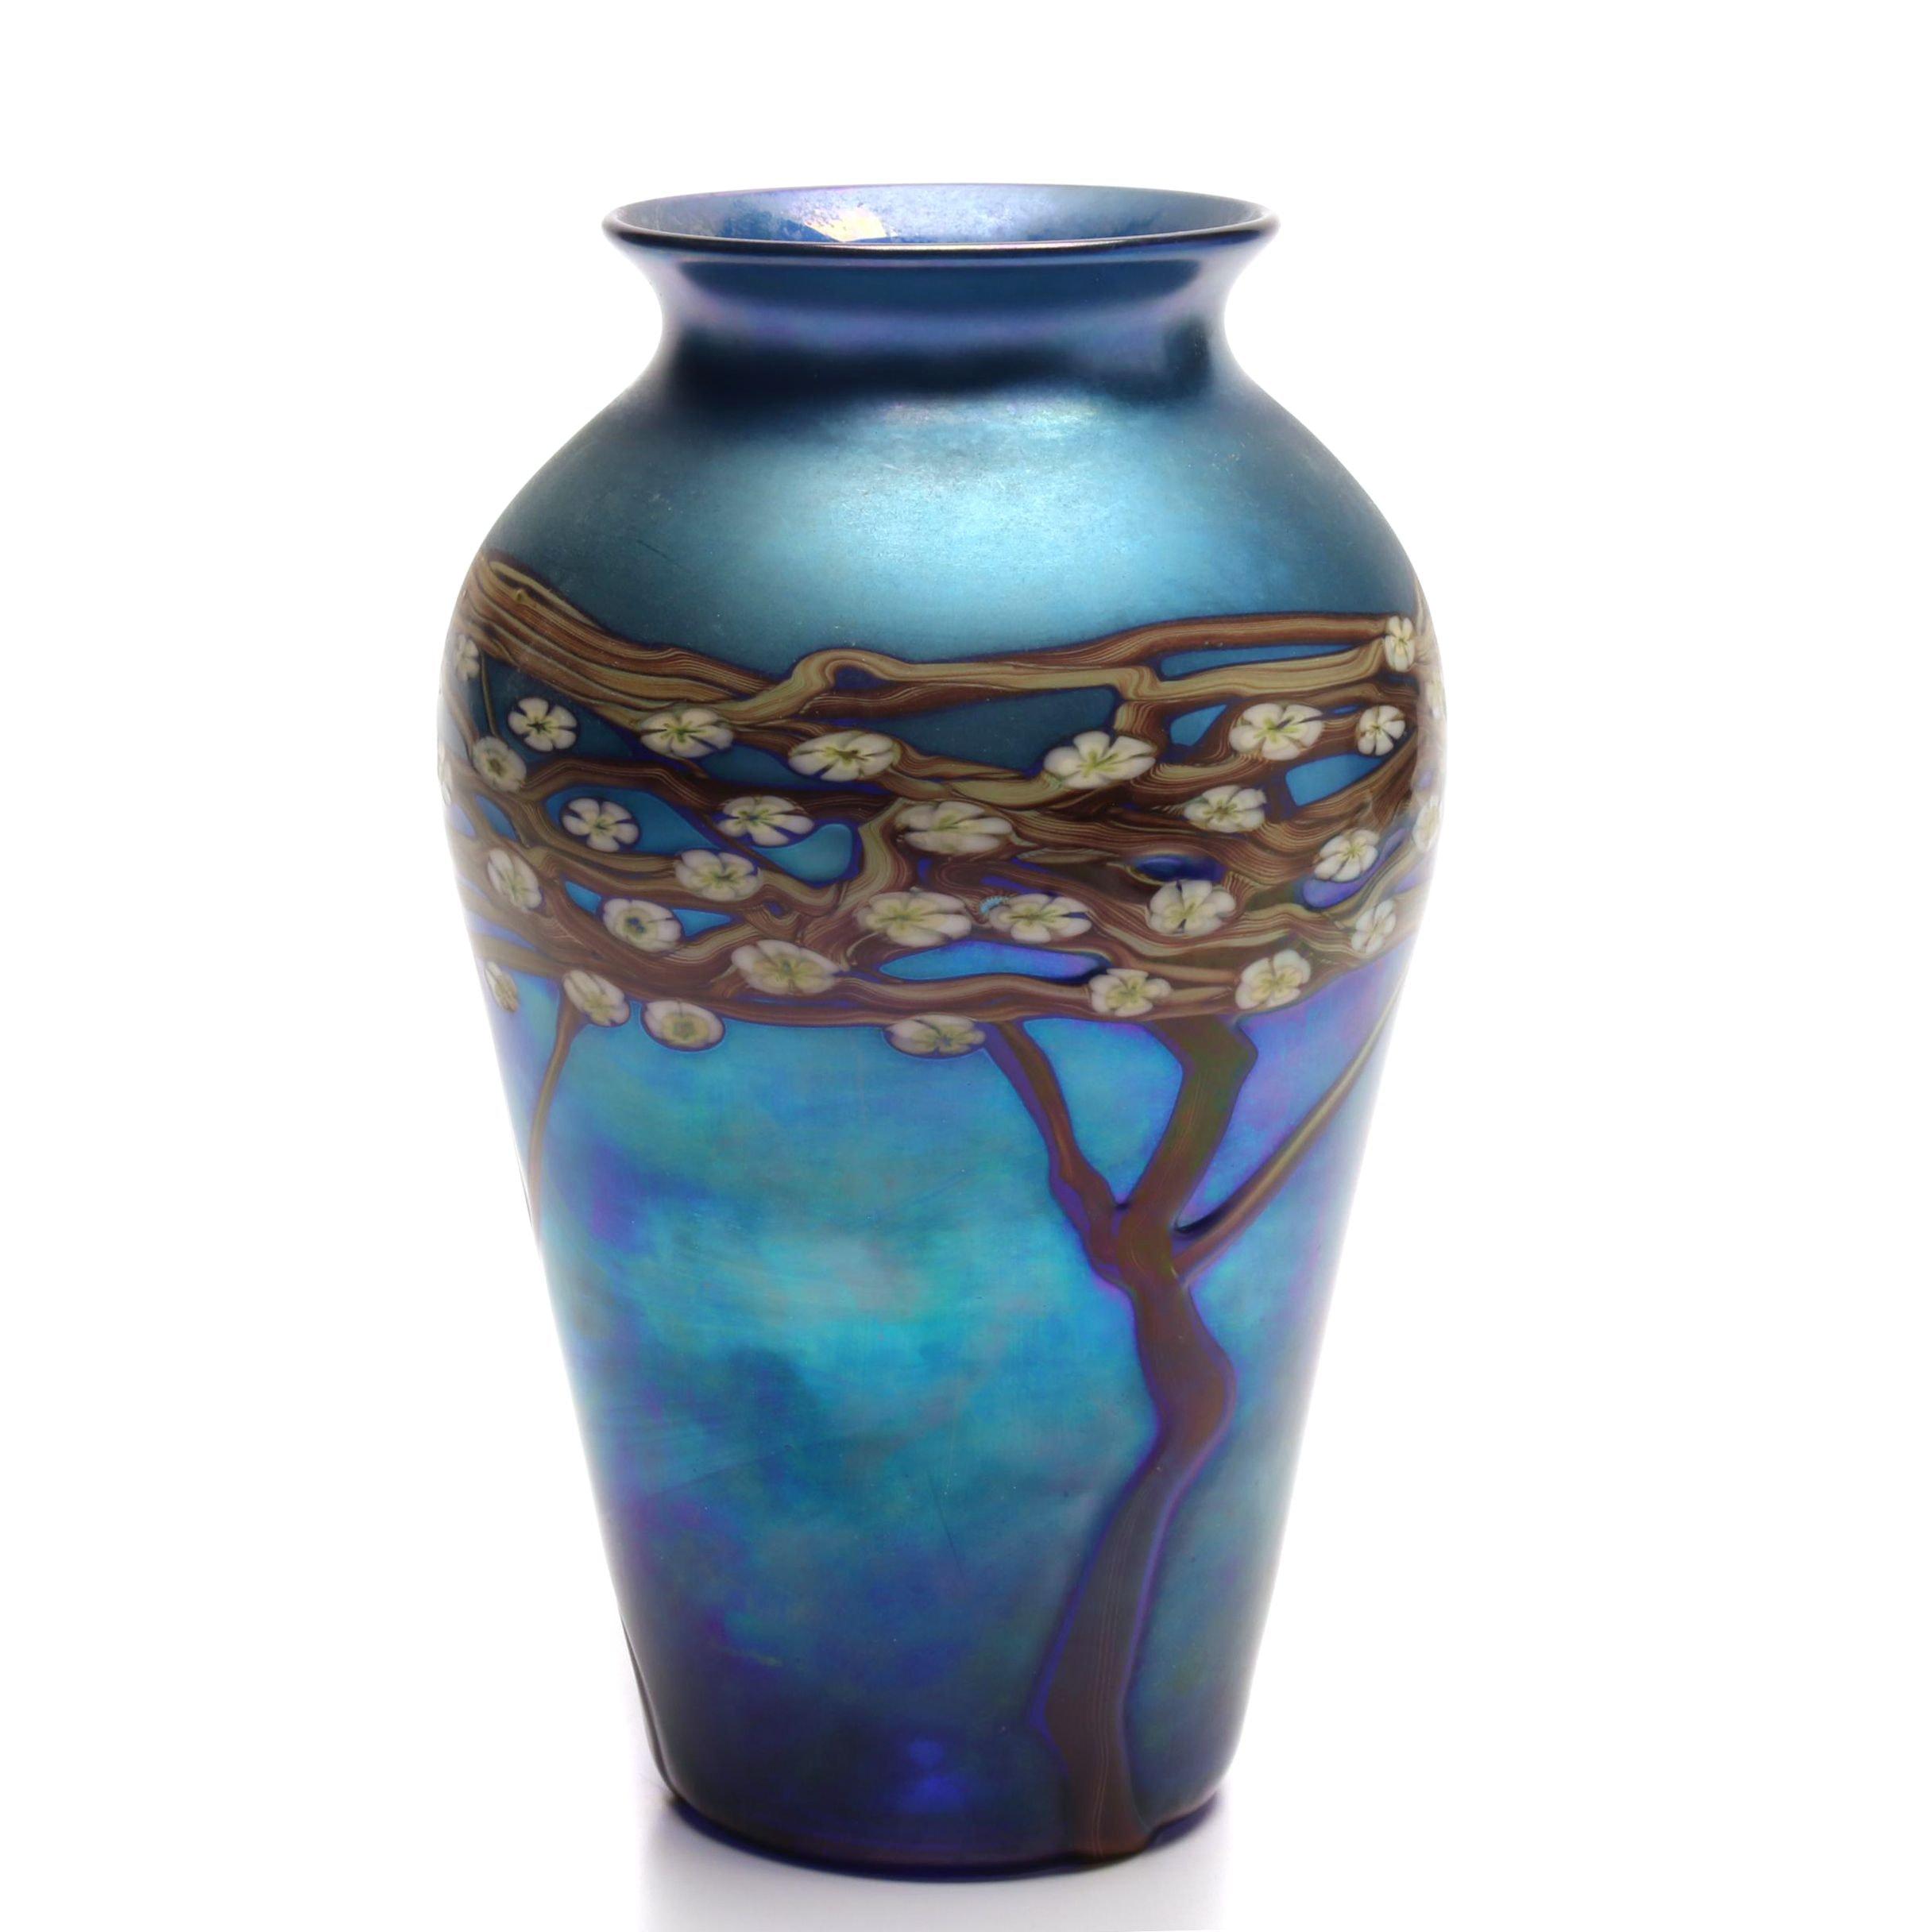 Zellique Art Glass Vase, Late 20th Century